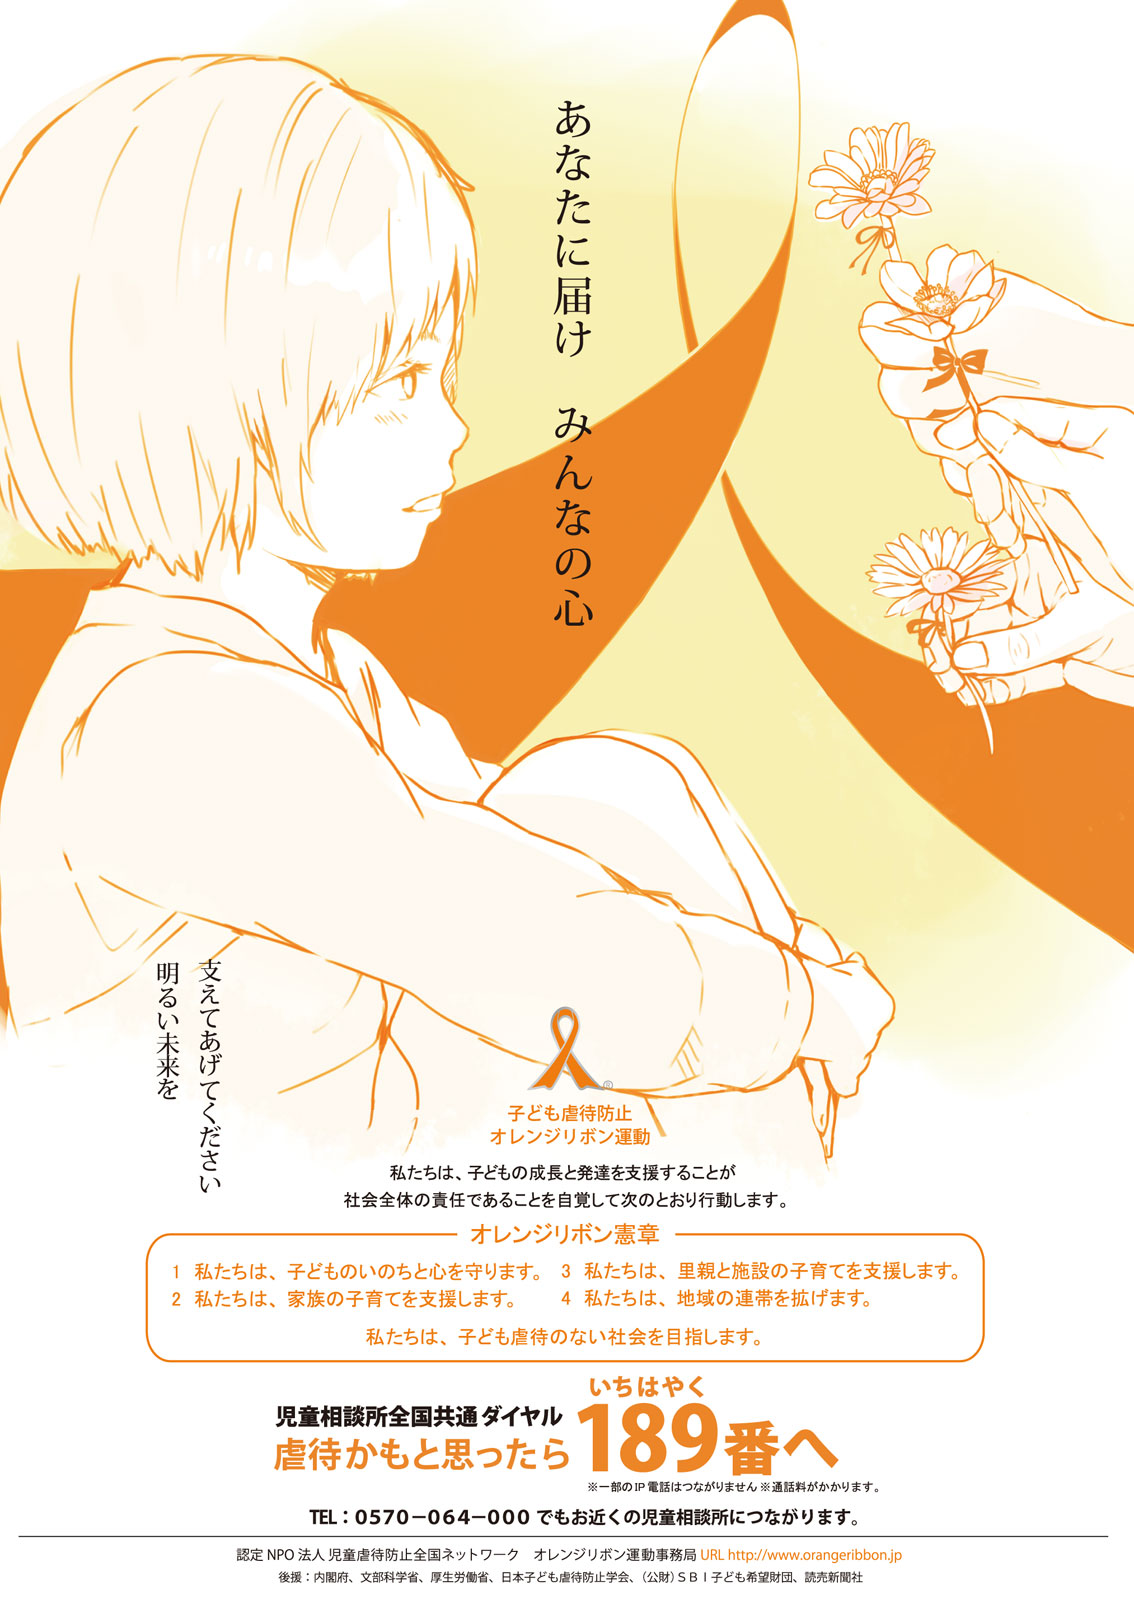 http://www.orangeribbon.jp/info/npo/contest/image/2015contest_kasaku1.jpg